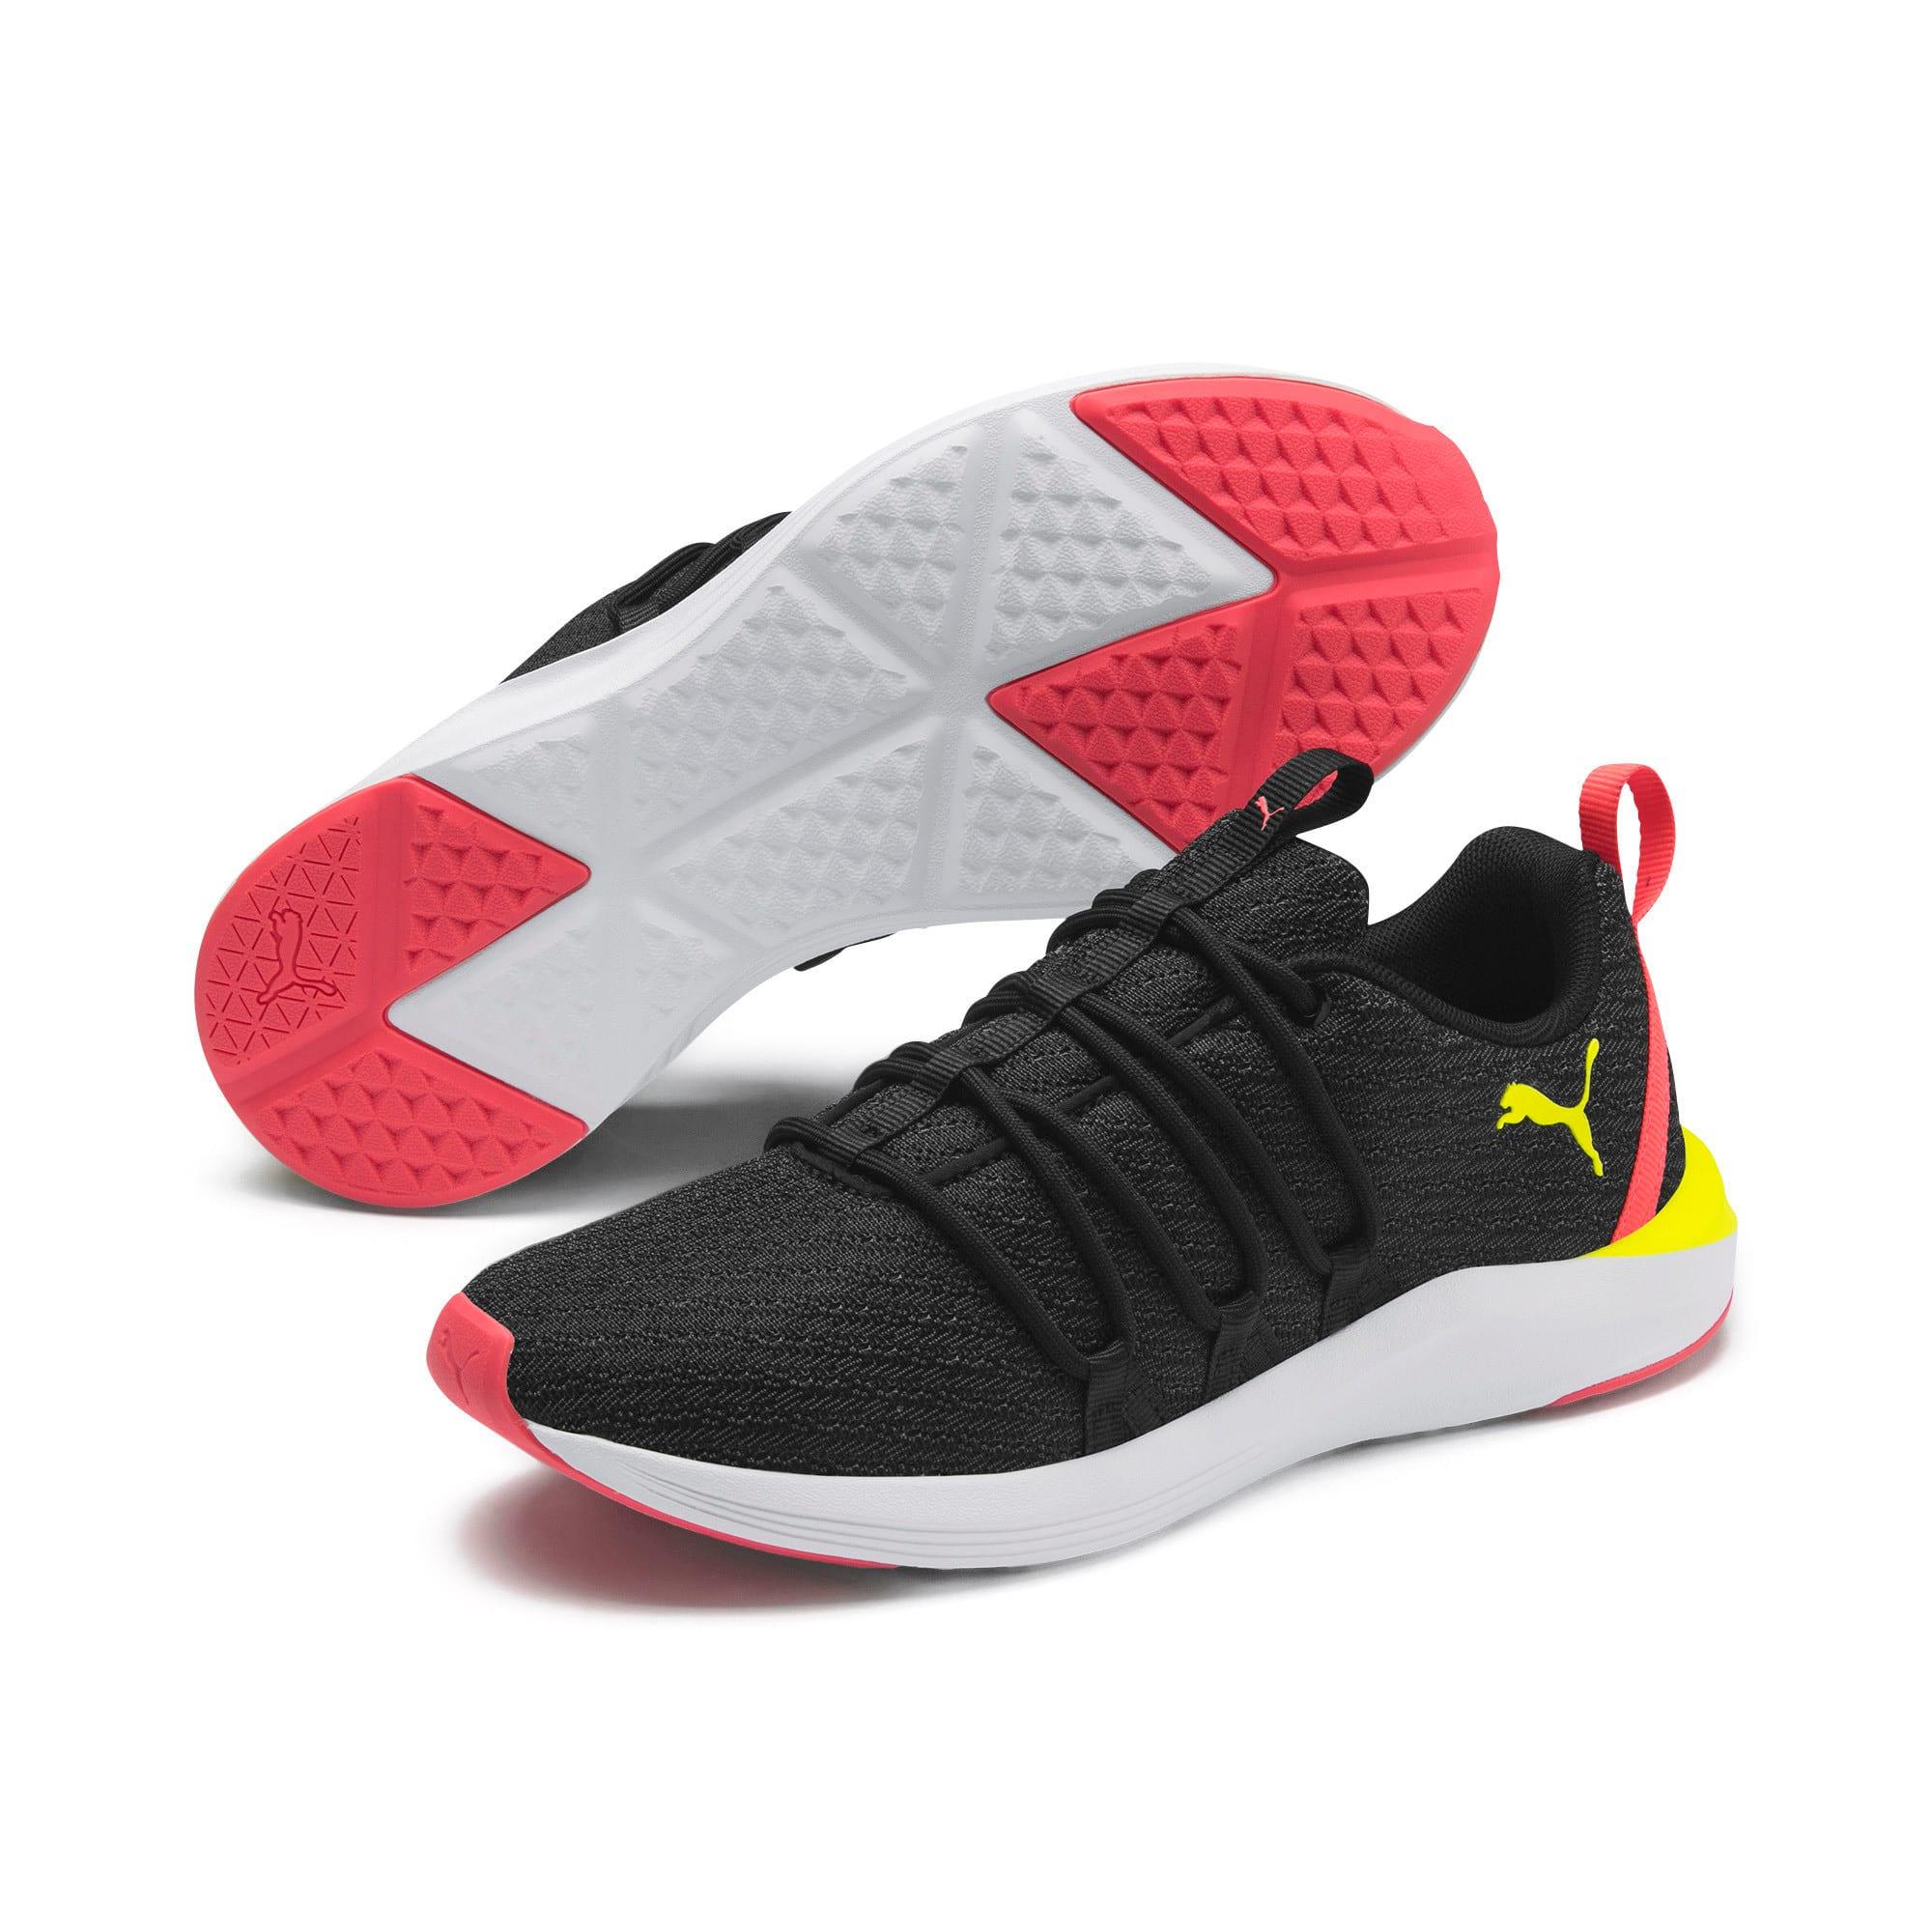 Imagen en miniatura 3 de Zapatillas de mujer Prowl Alt Neon, Puma Black-Yellow Alert, mediana